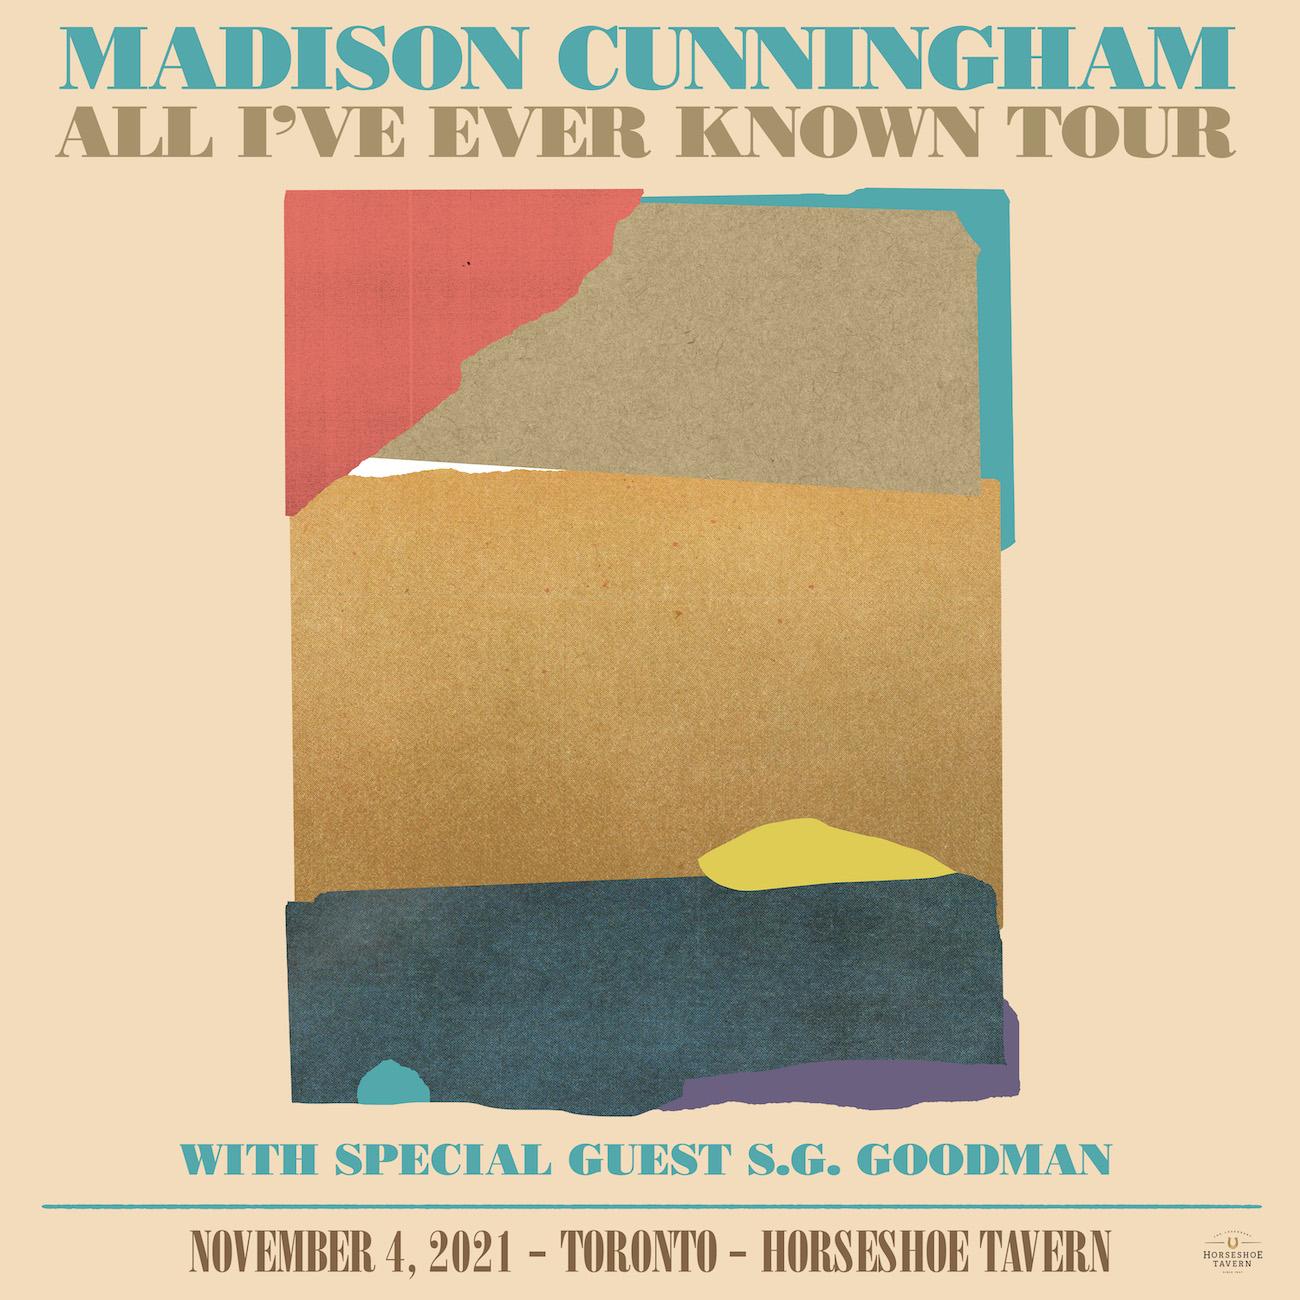 Madison Cunningham